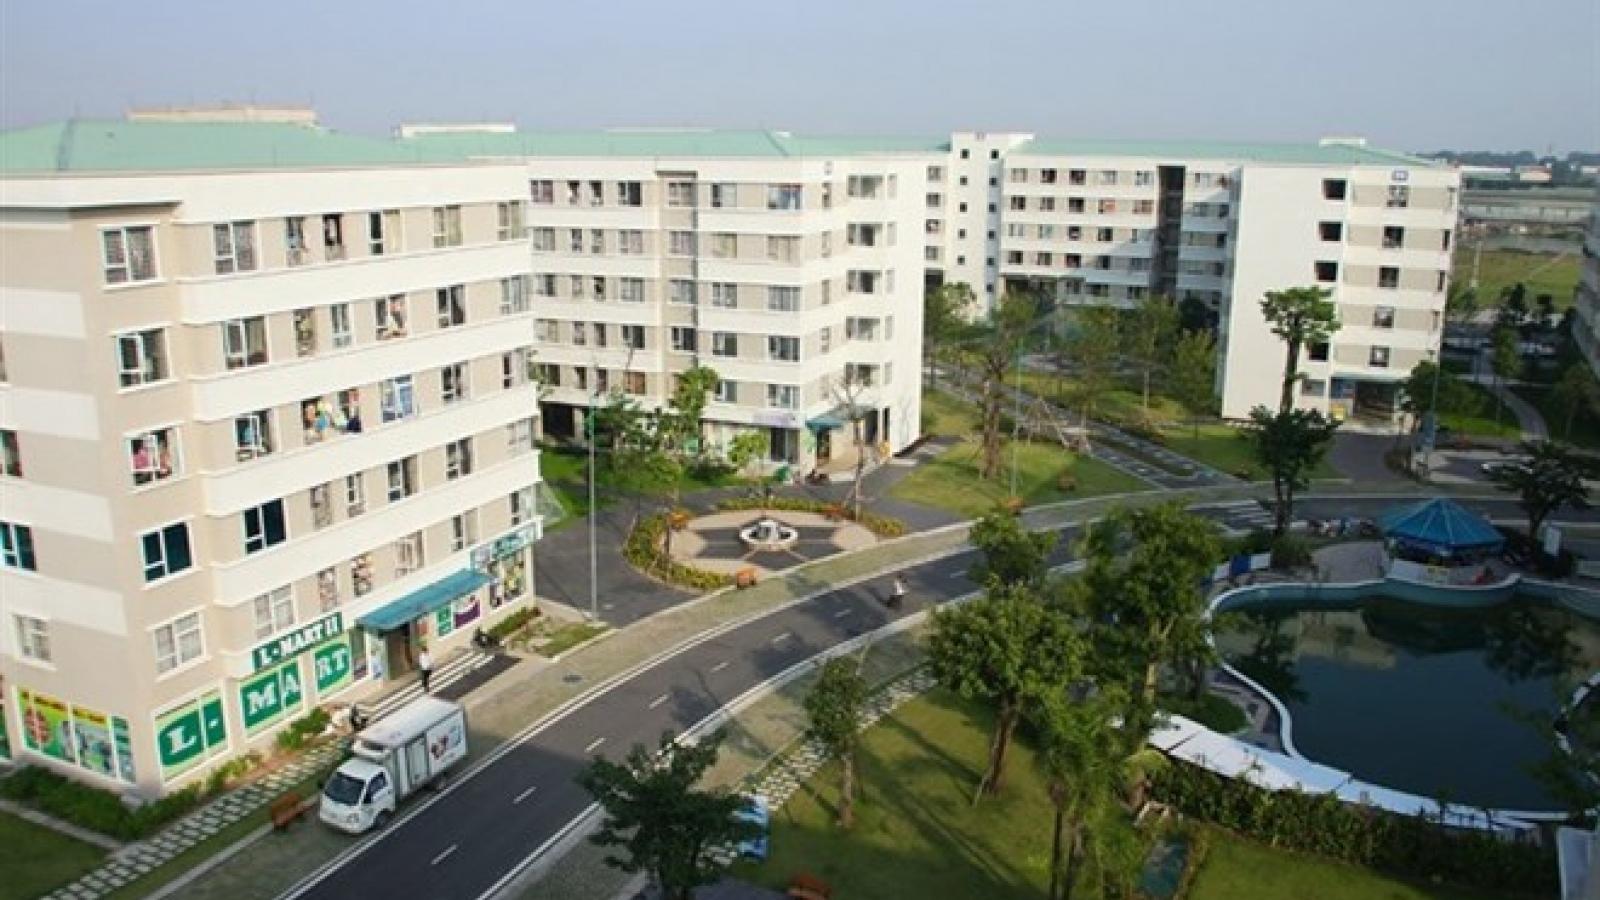 Major social housing targets seem beyond reach